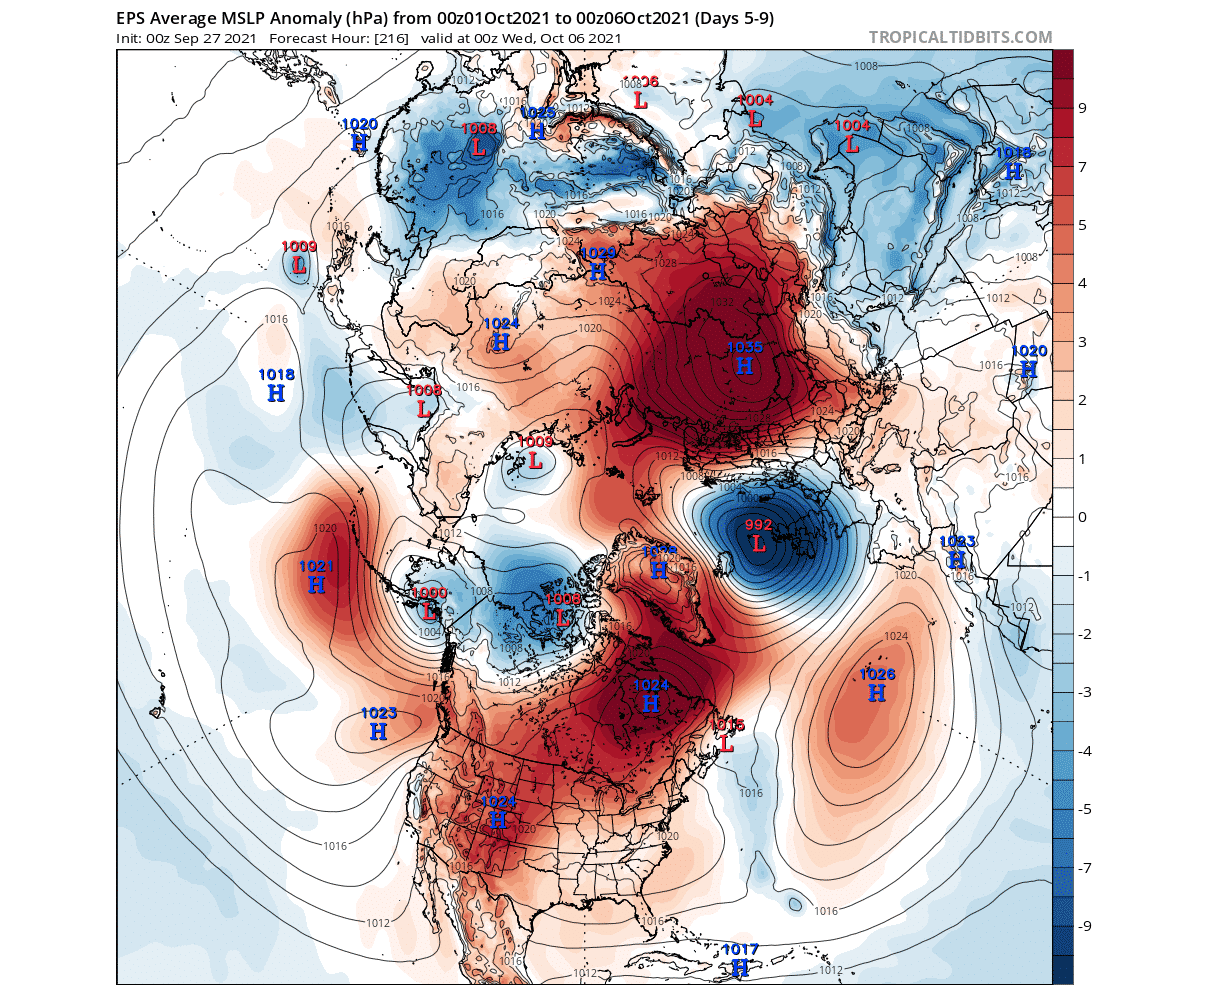 north-hemisphere-ecmwf-pressure-anomaly-forecast-october-week-1